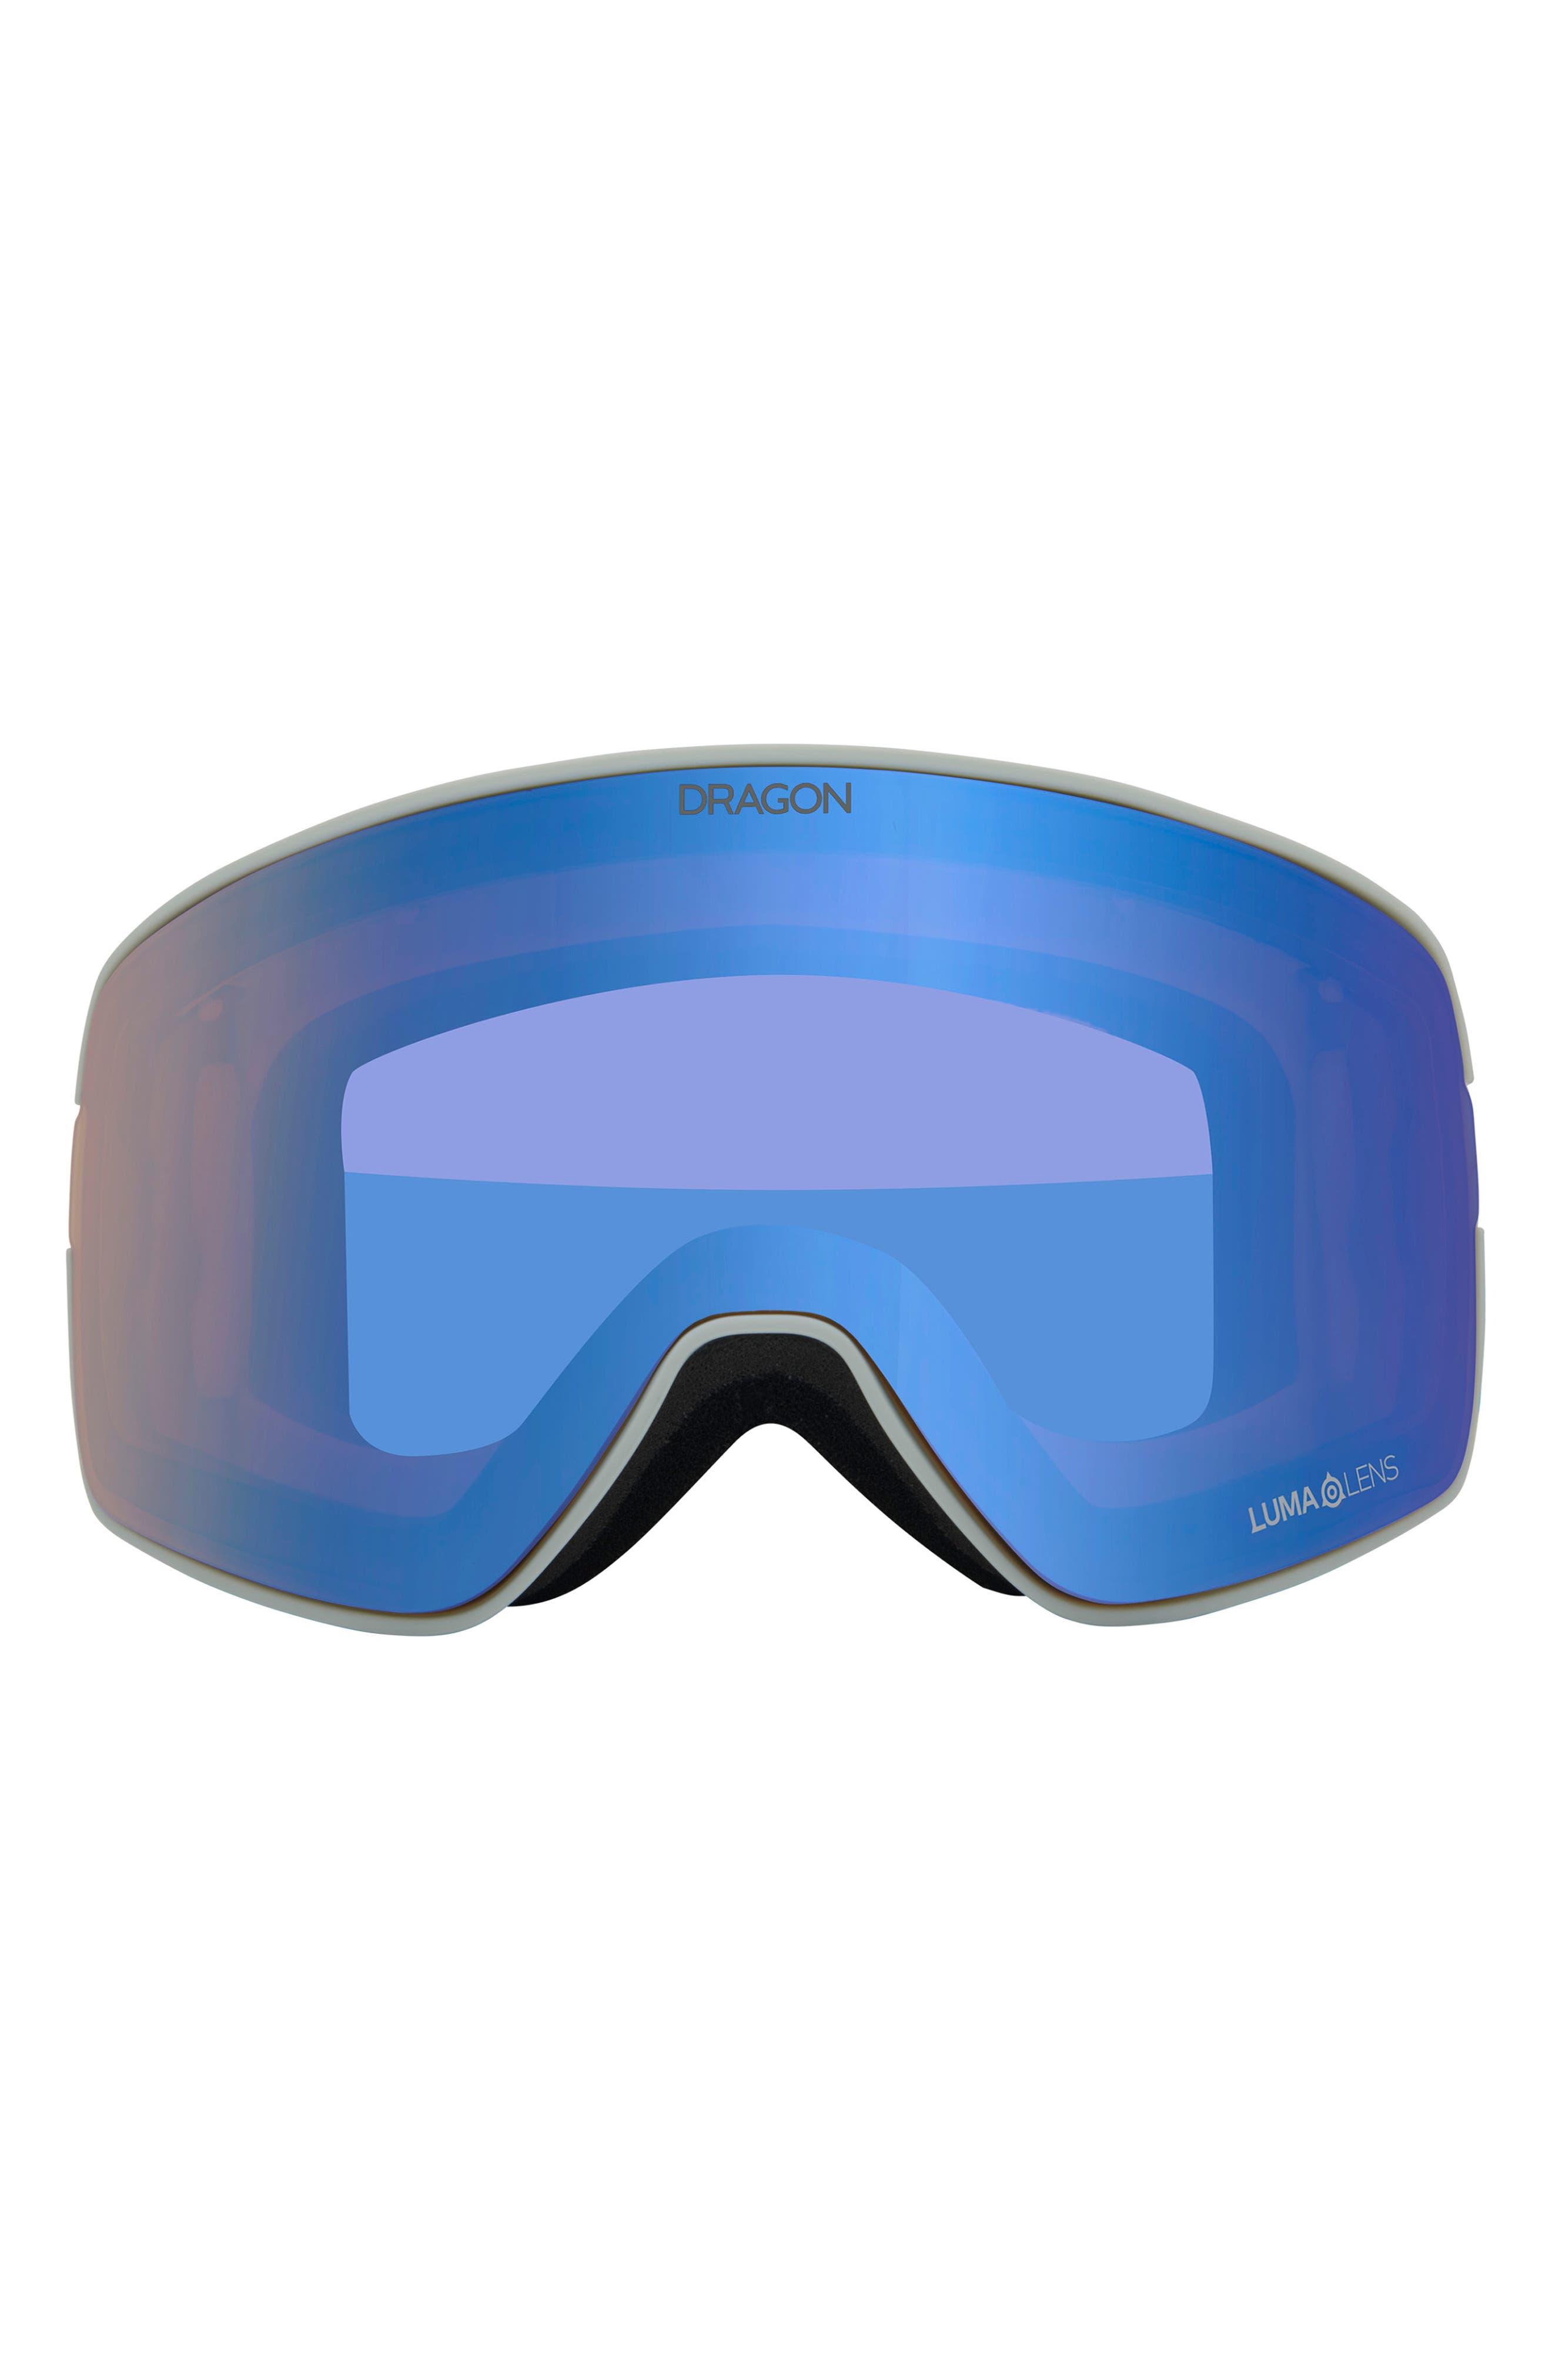 Nfx2 60mm Snow Goggles With Bonus Lens